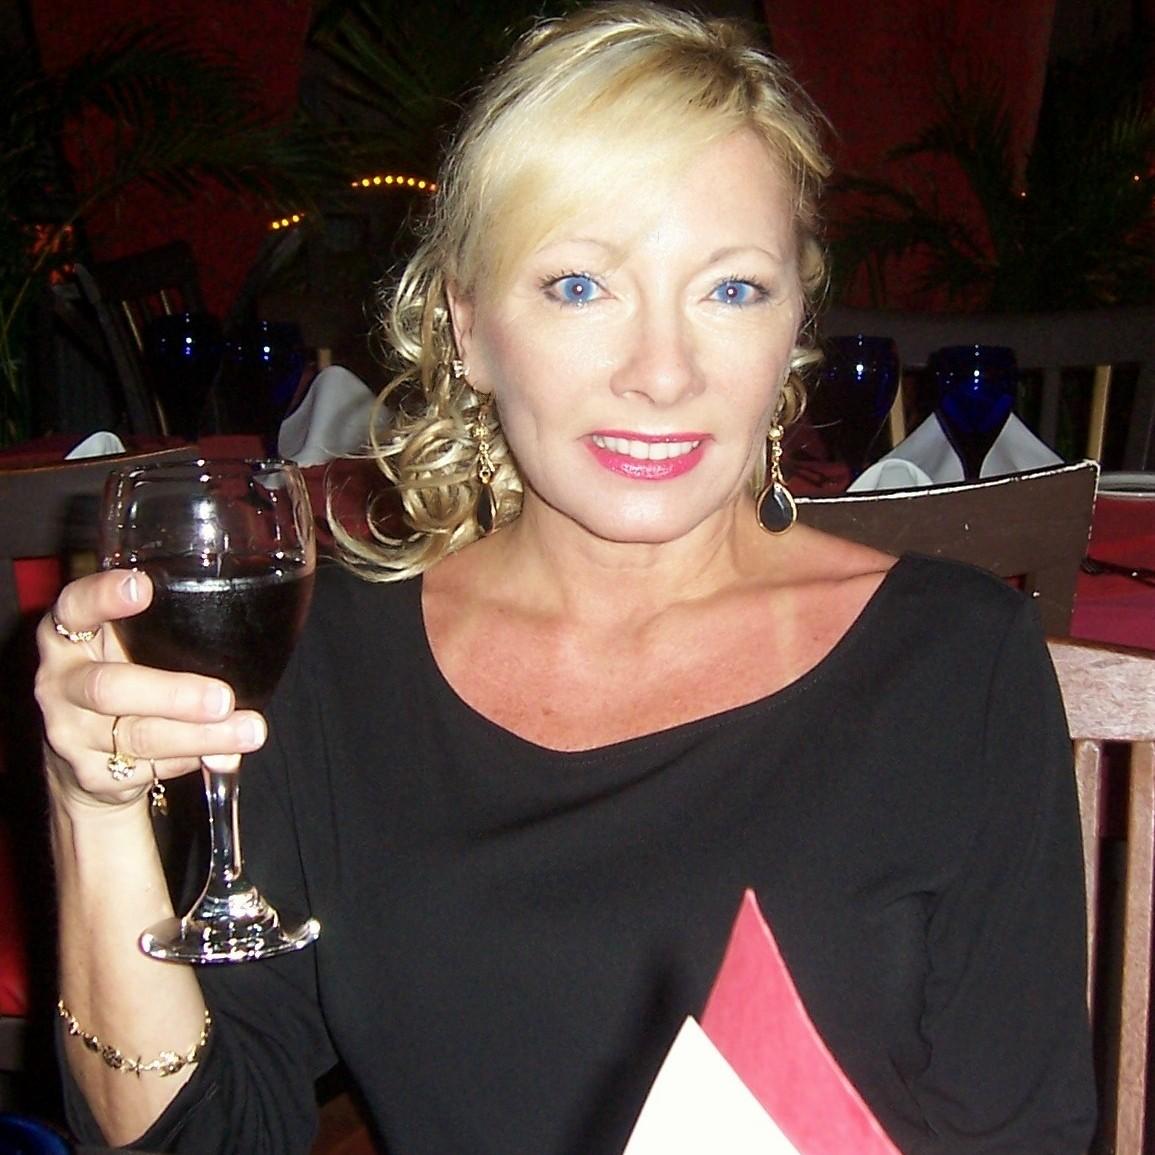 Lisa Codianne Fowler